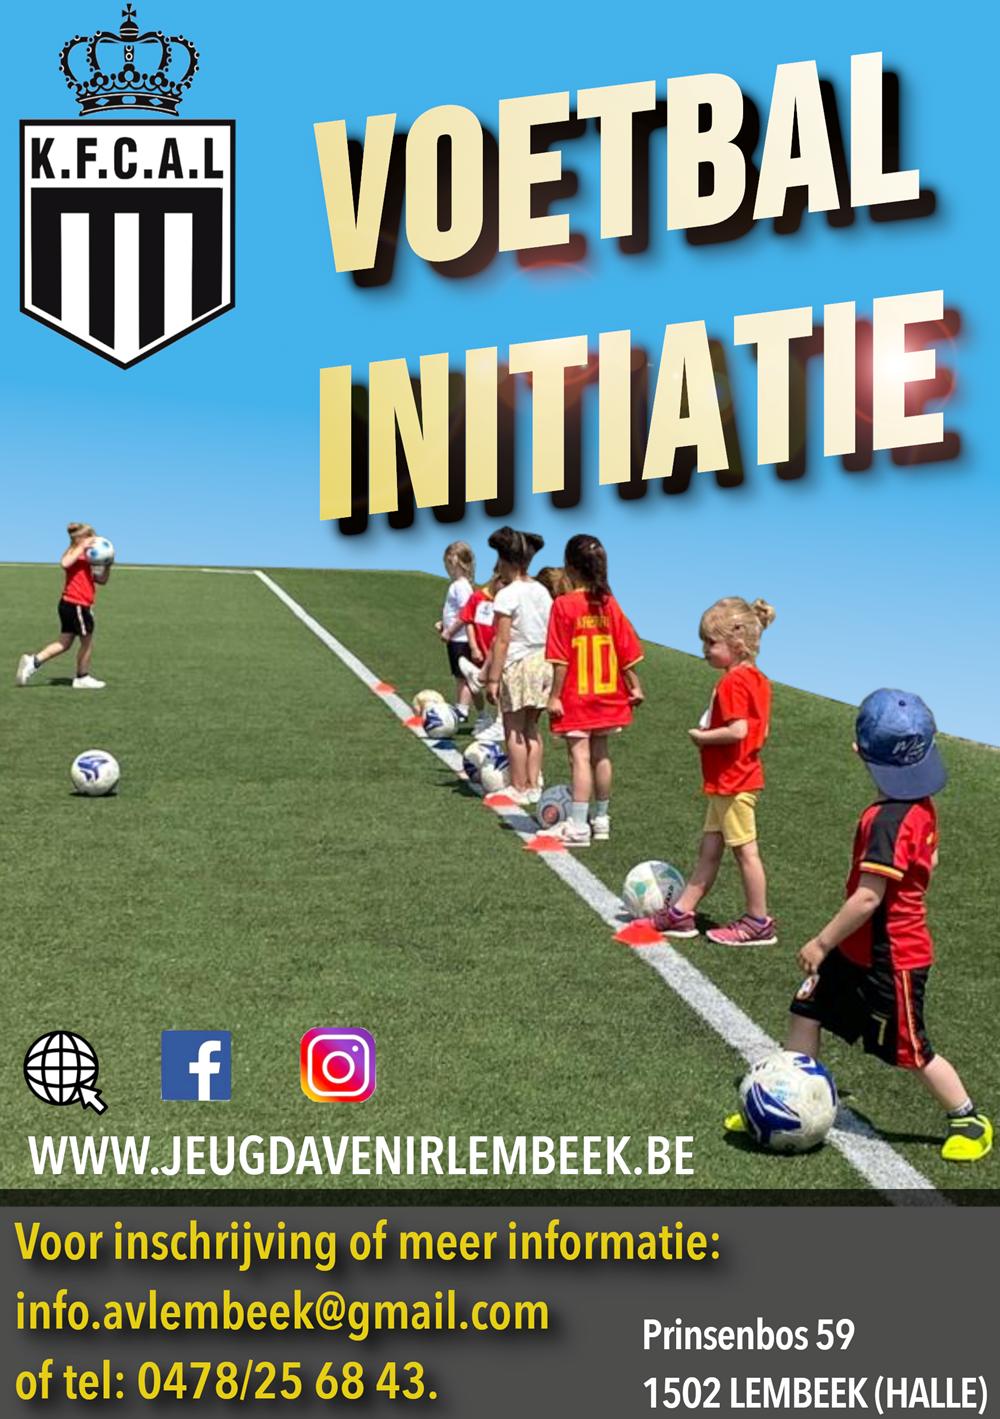 Initiatie_voetbal_2021_v2.png